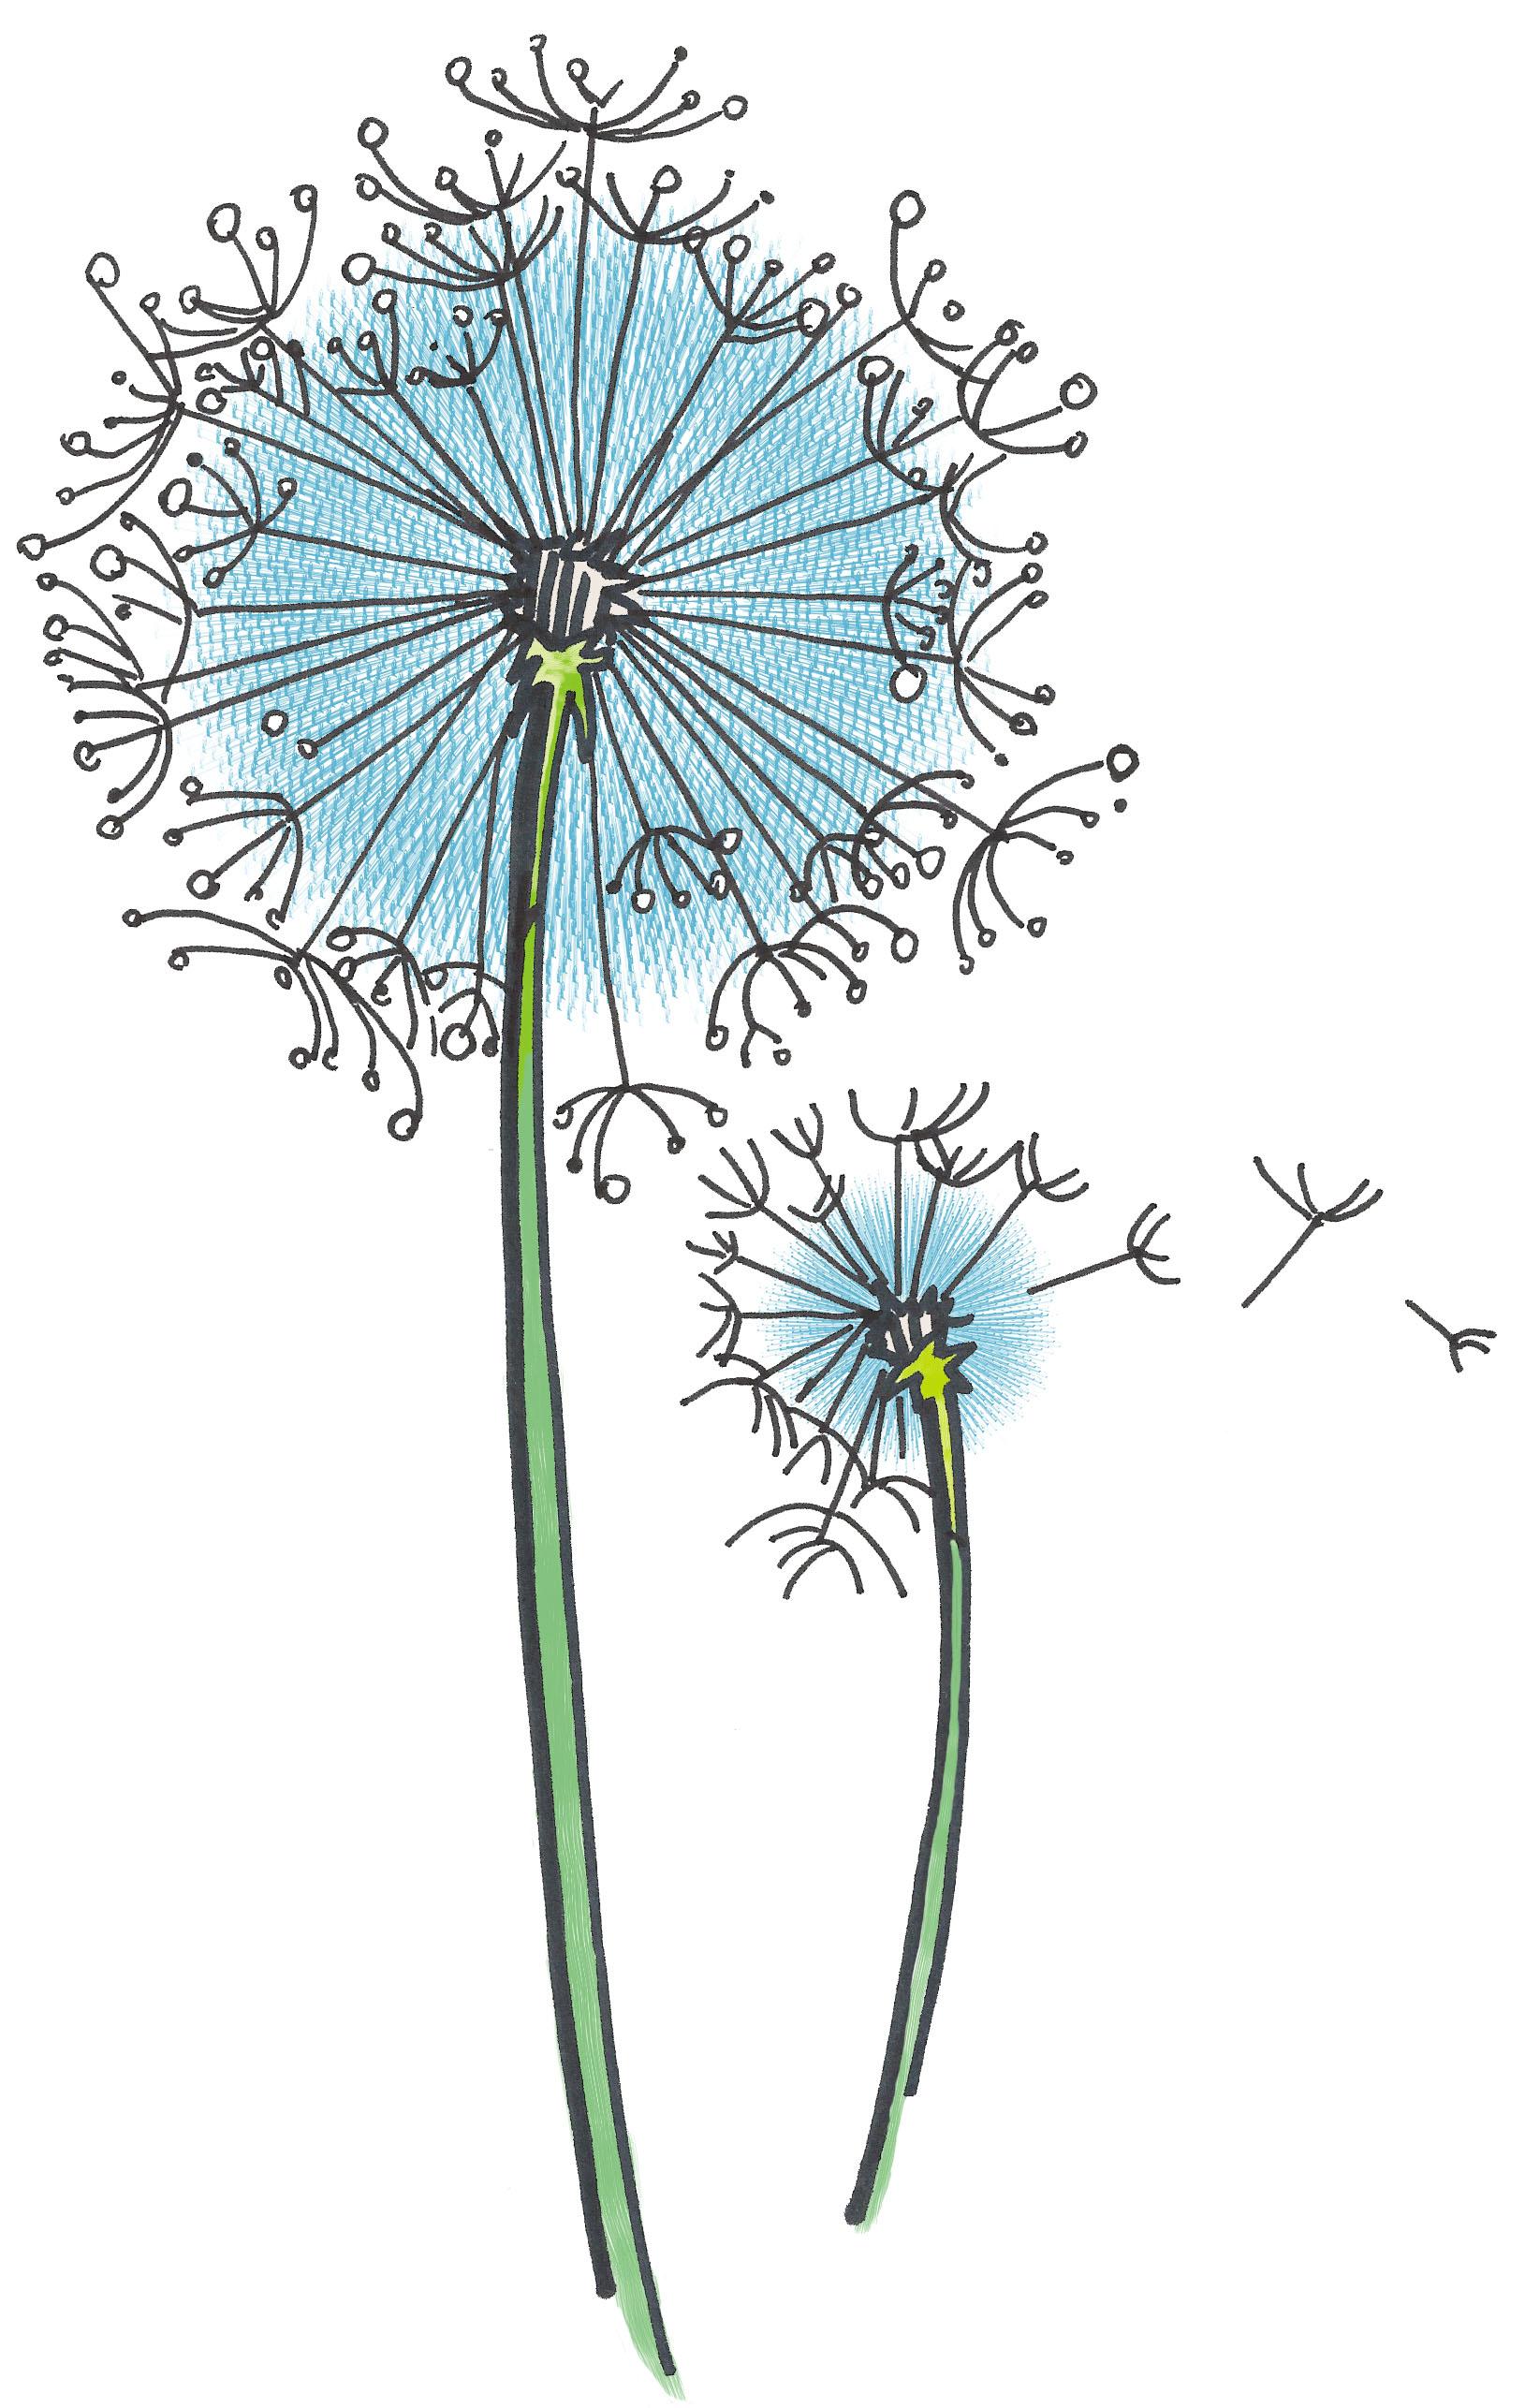 - dandelion illustration -